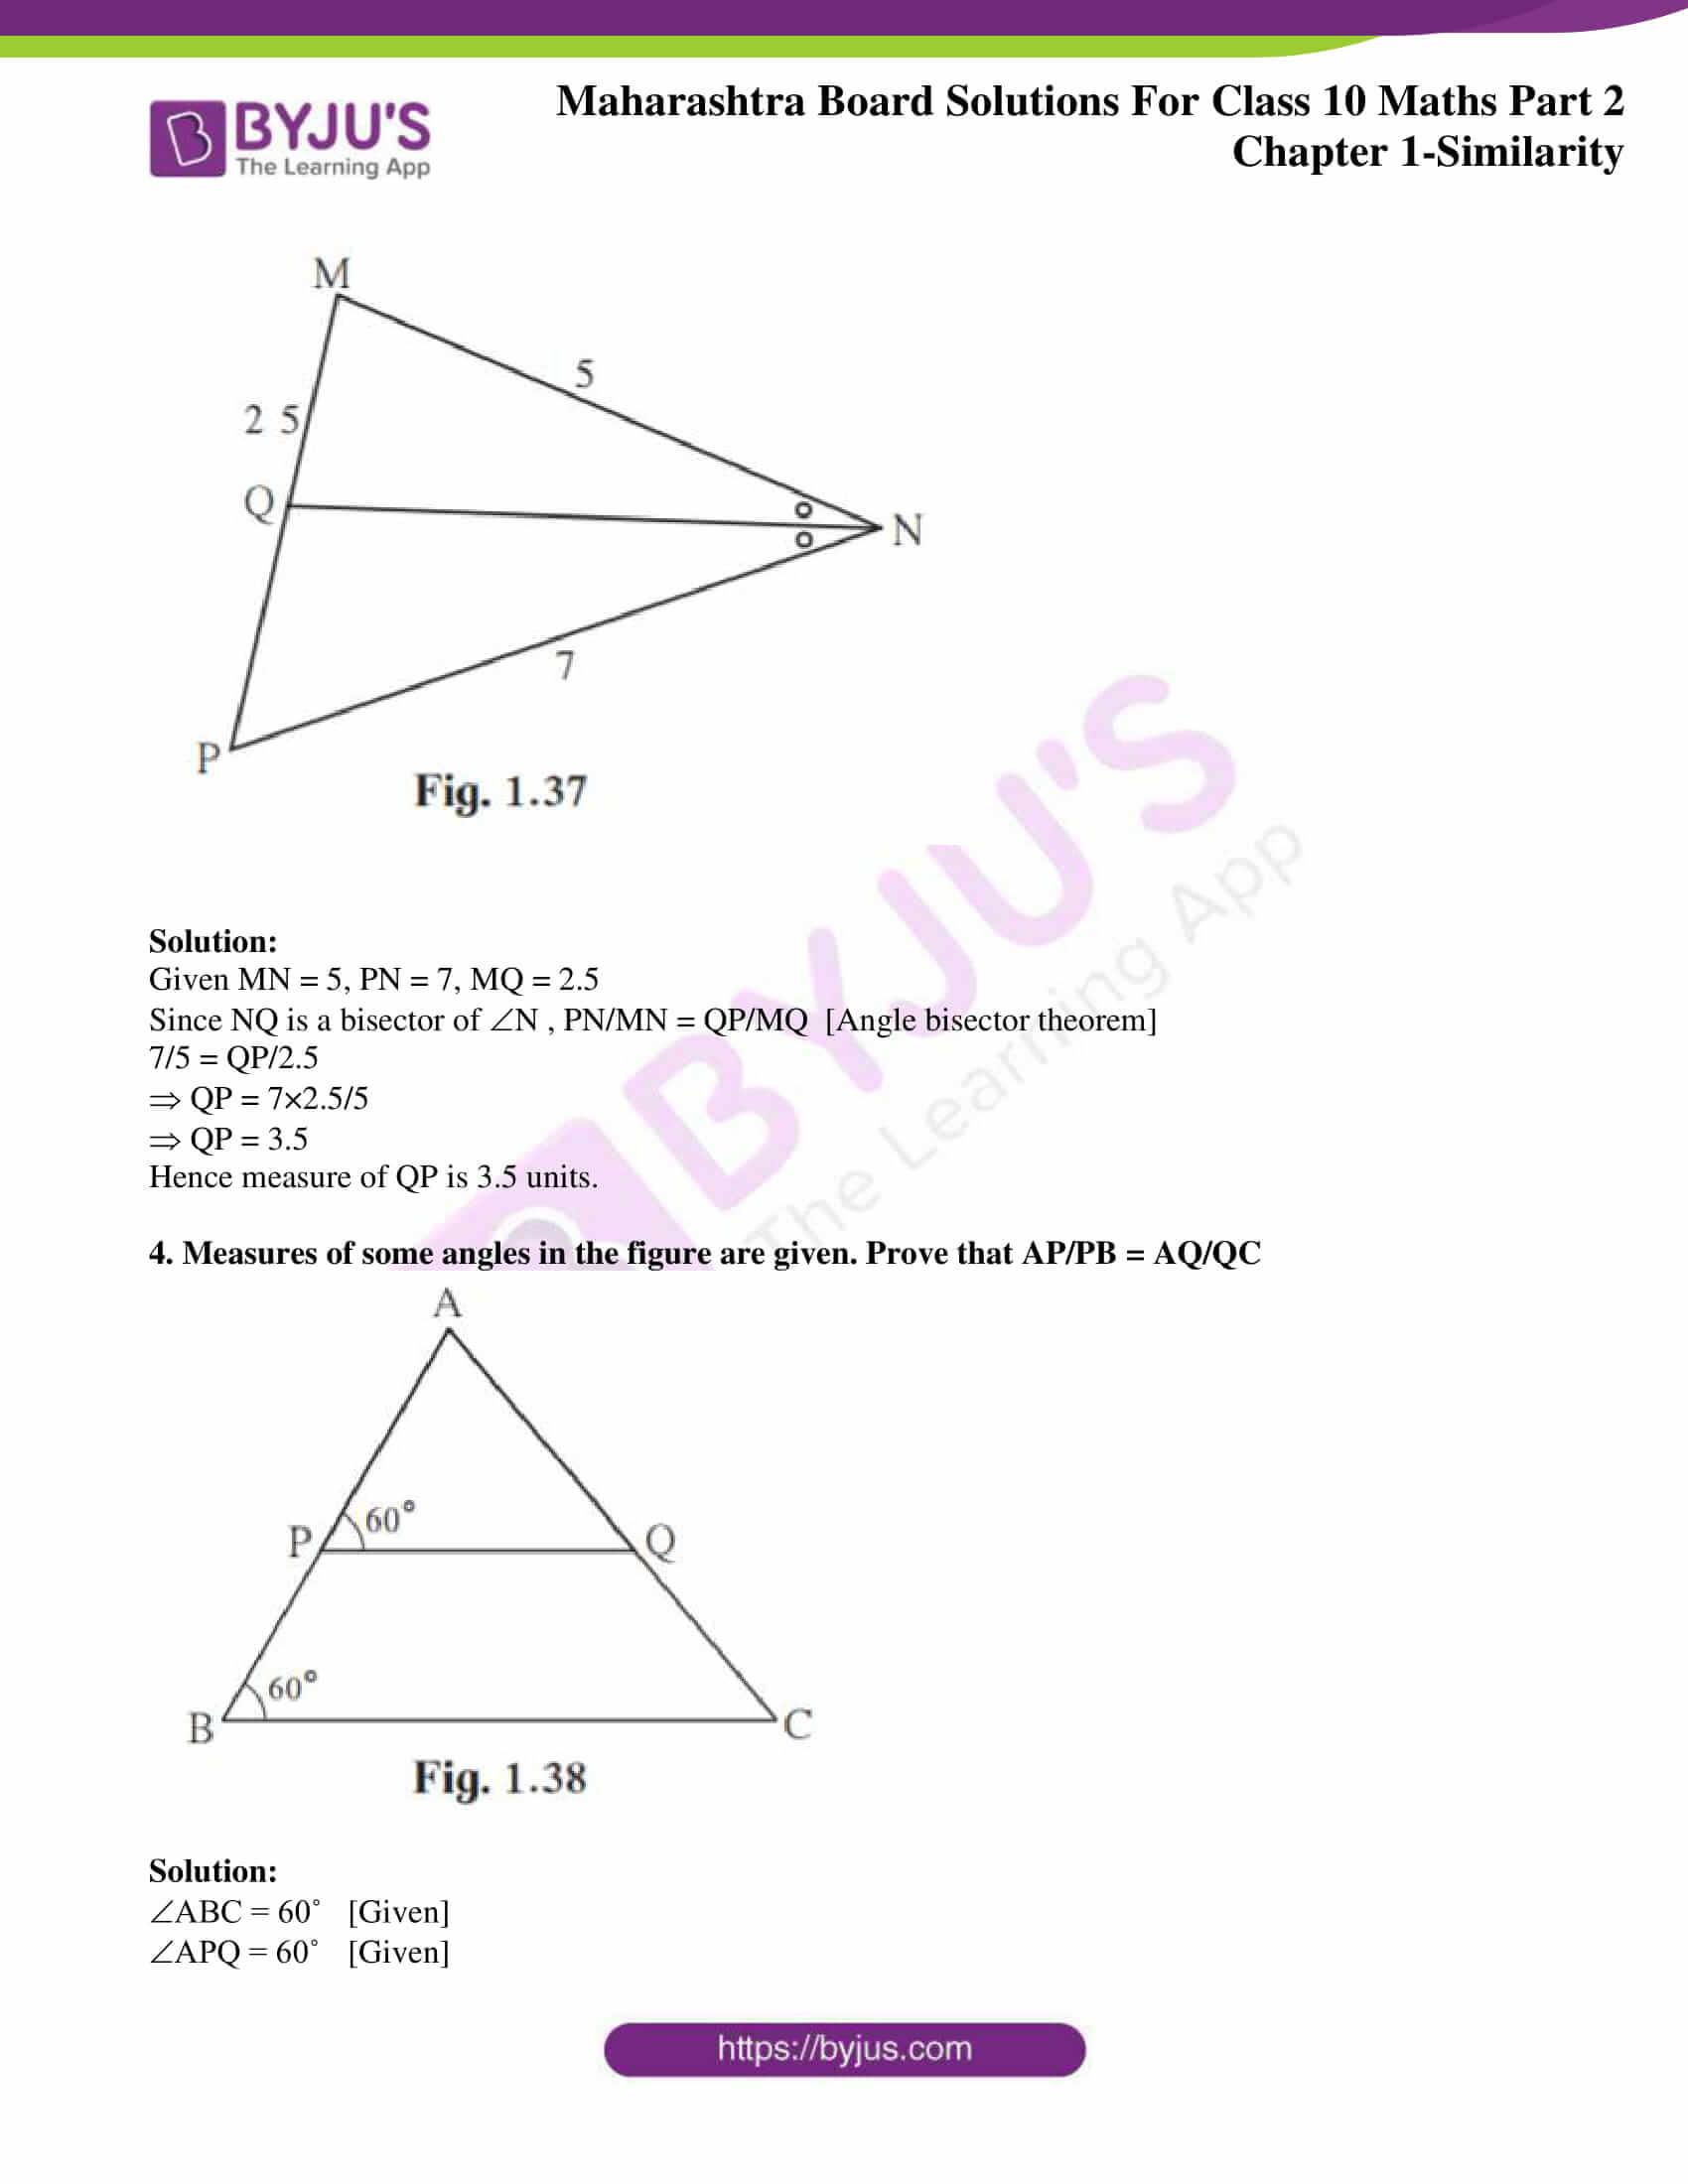 msbshse sol class 10 maths part 2 chapter 1 07